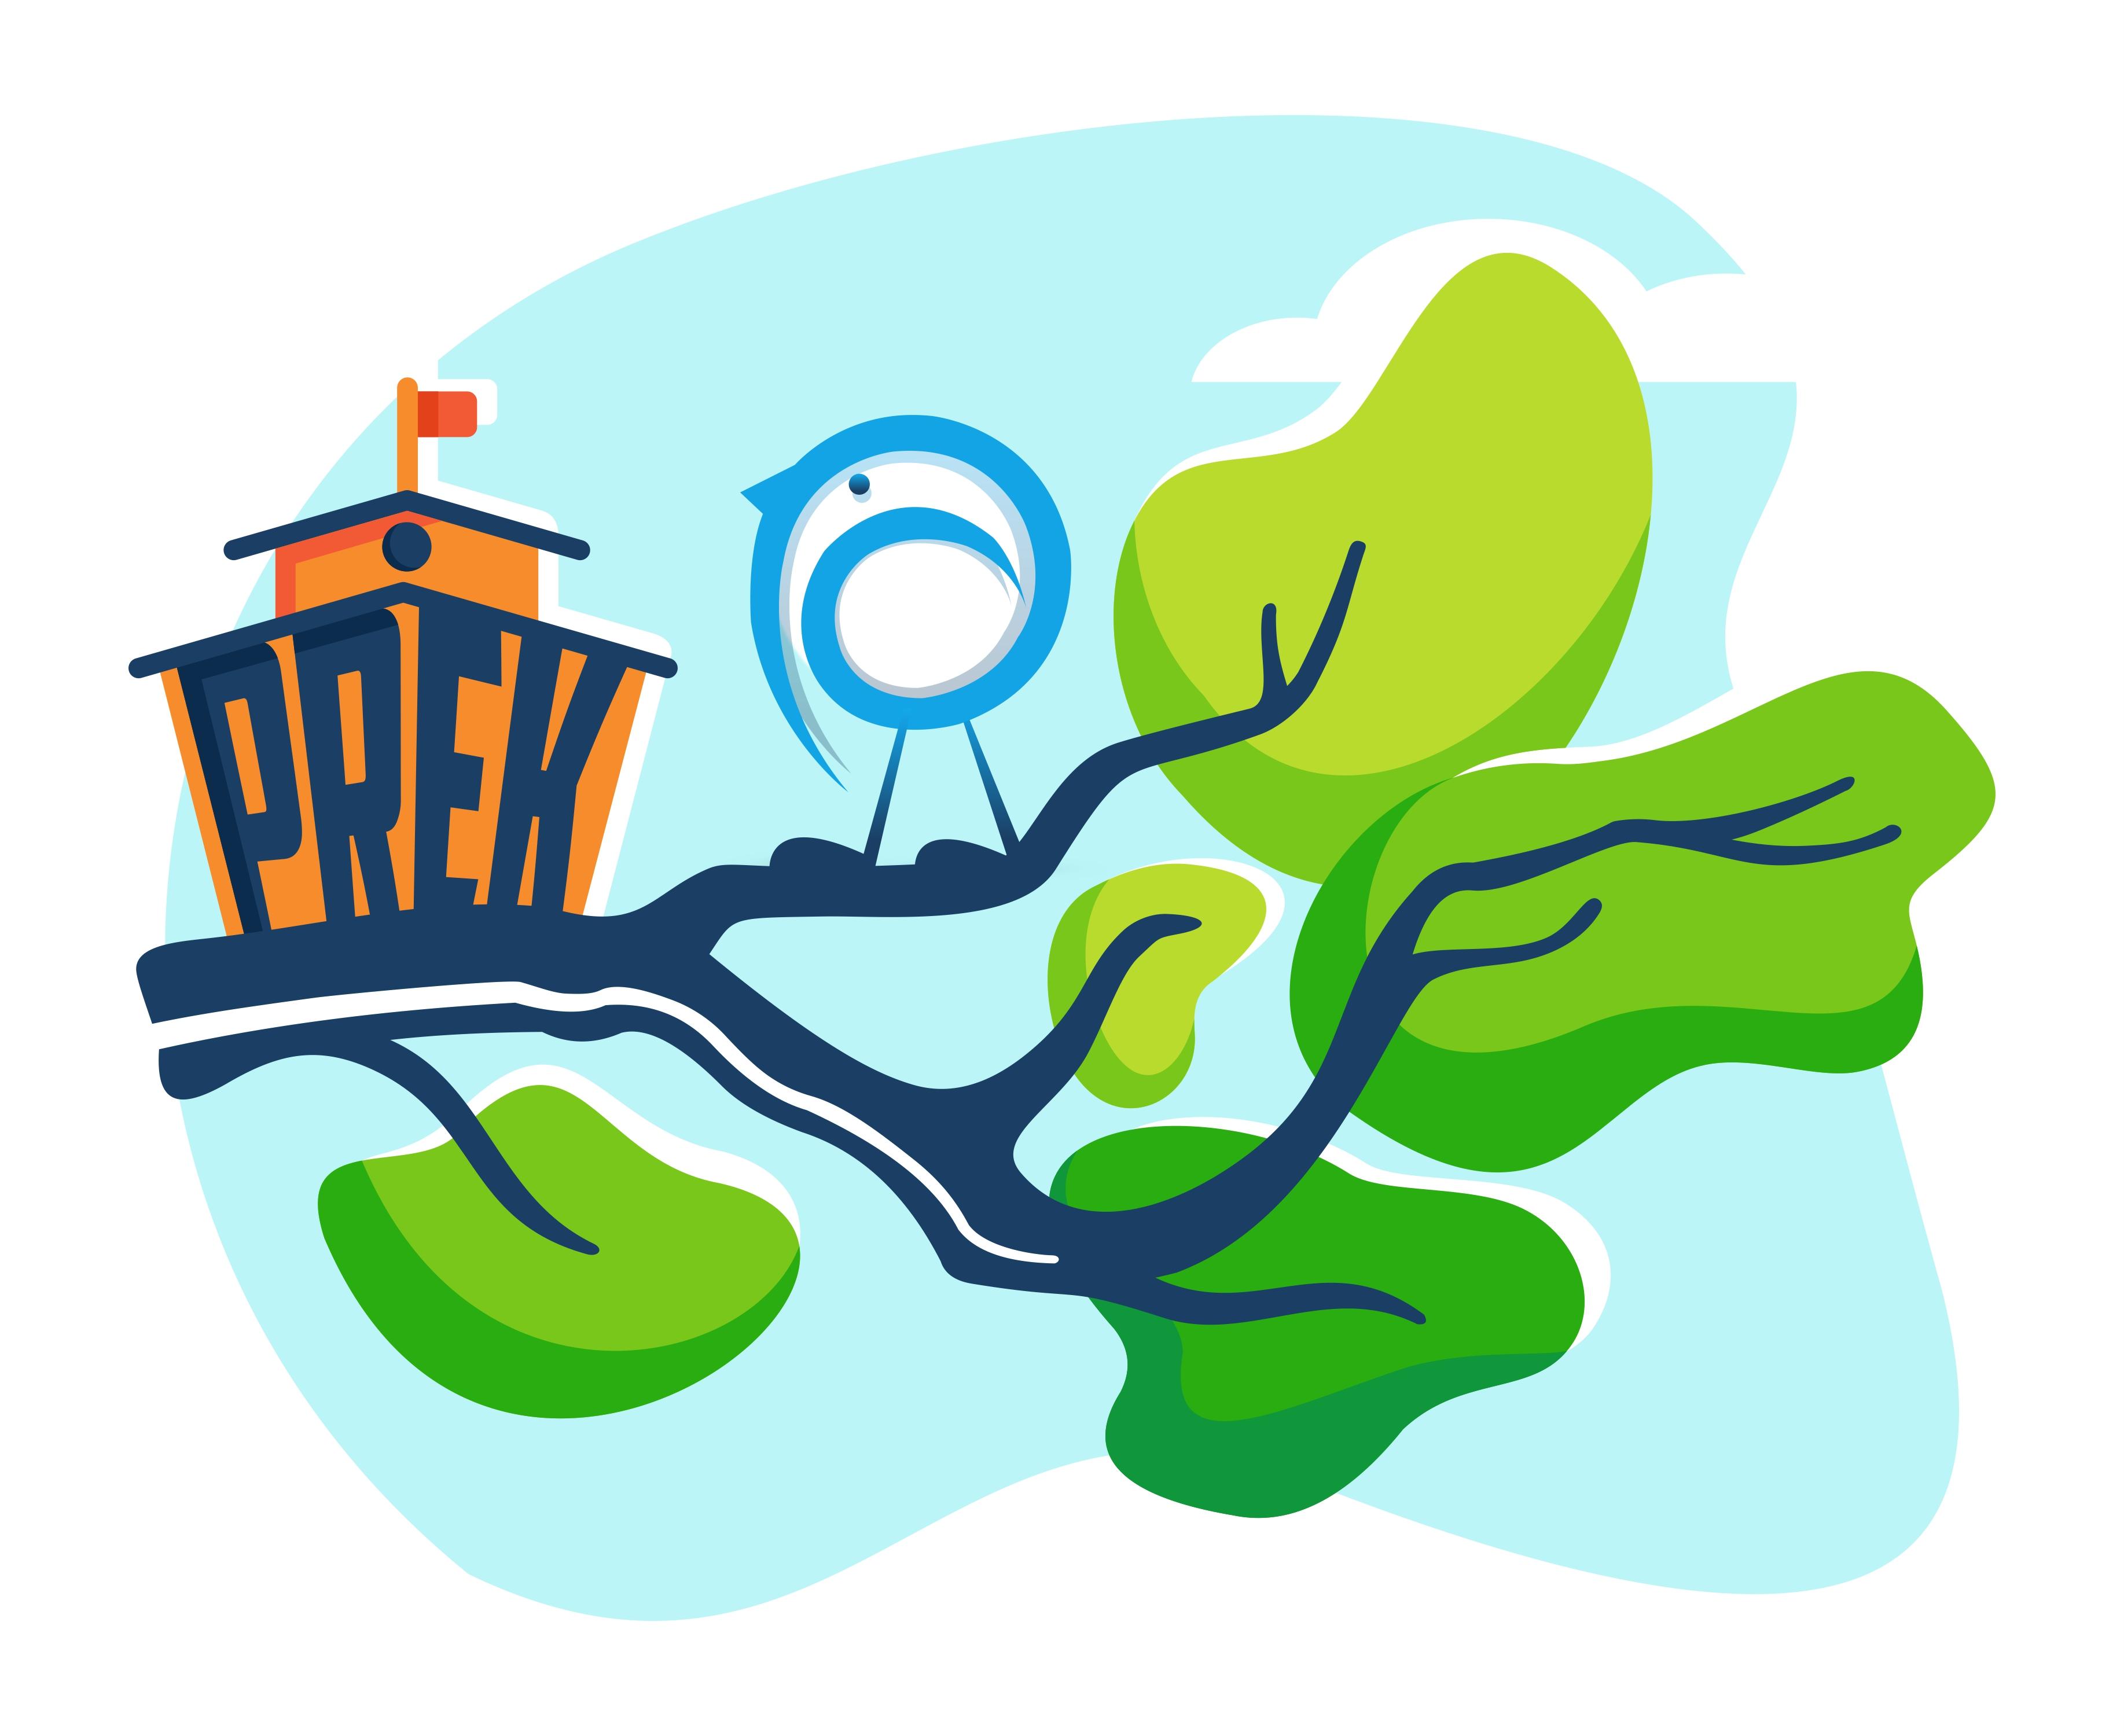 ScribPreK illustration